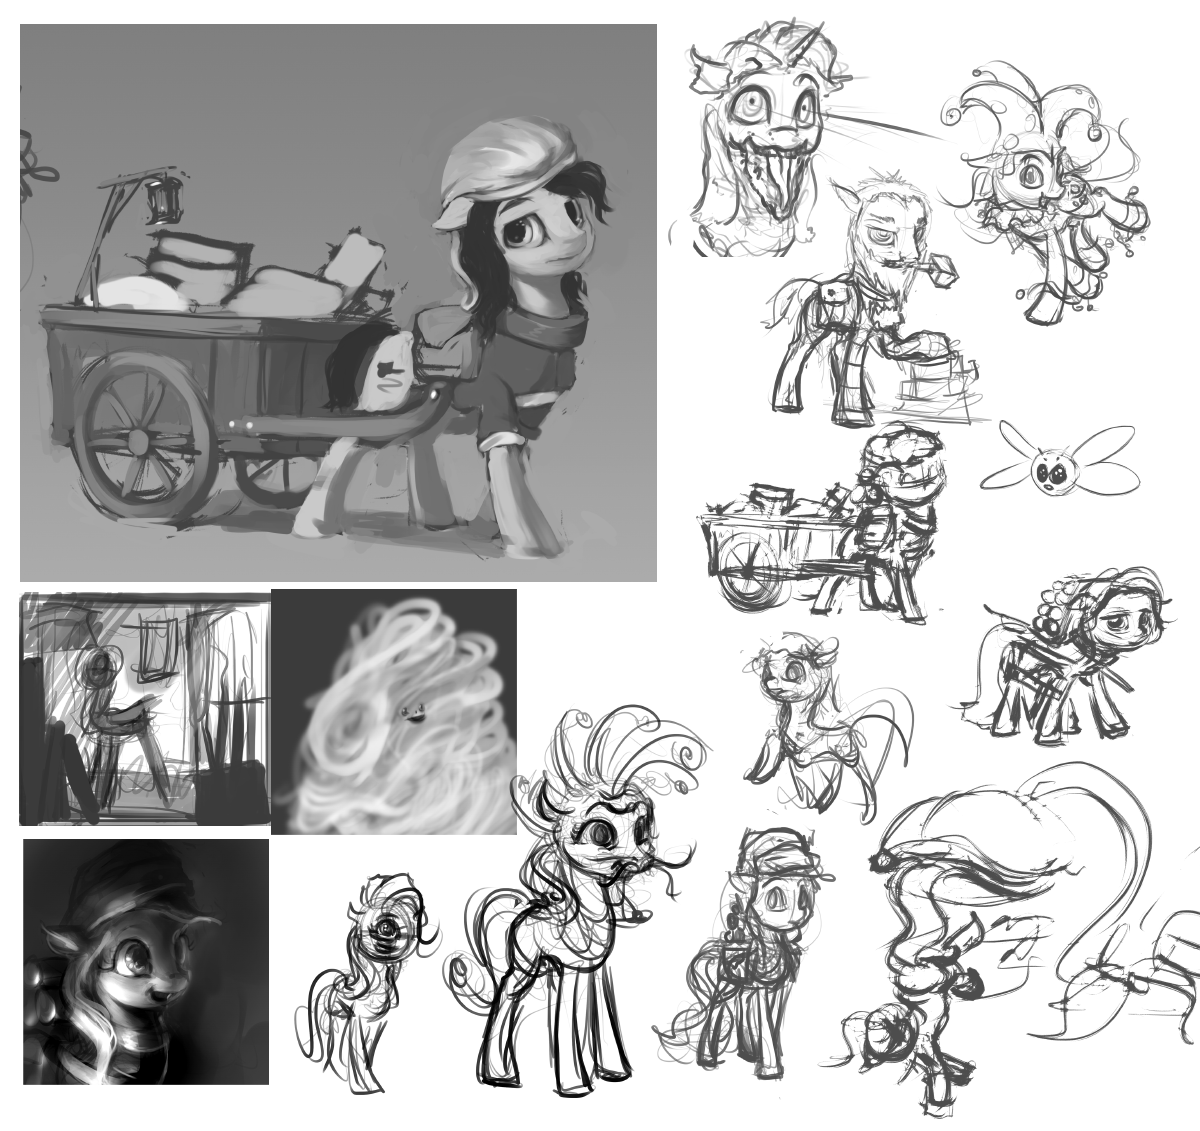 Sketchdump 20141206 #01 by AssasinMonkey